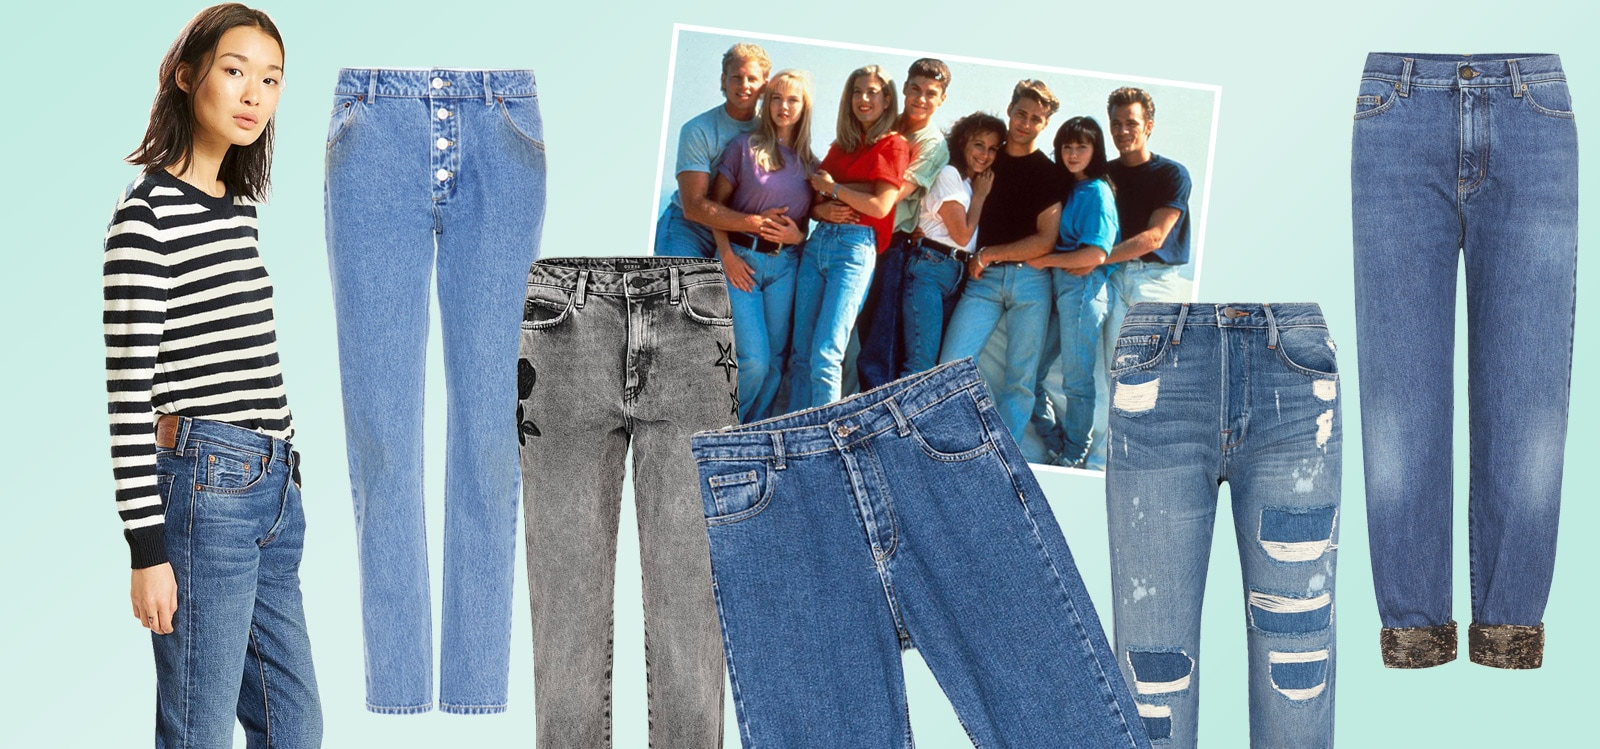 DESKTOP_jeans_momfit